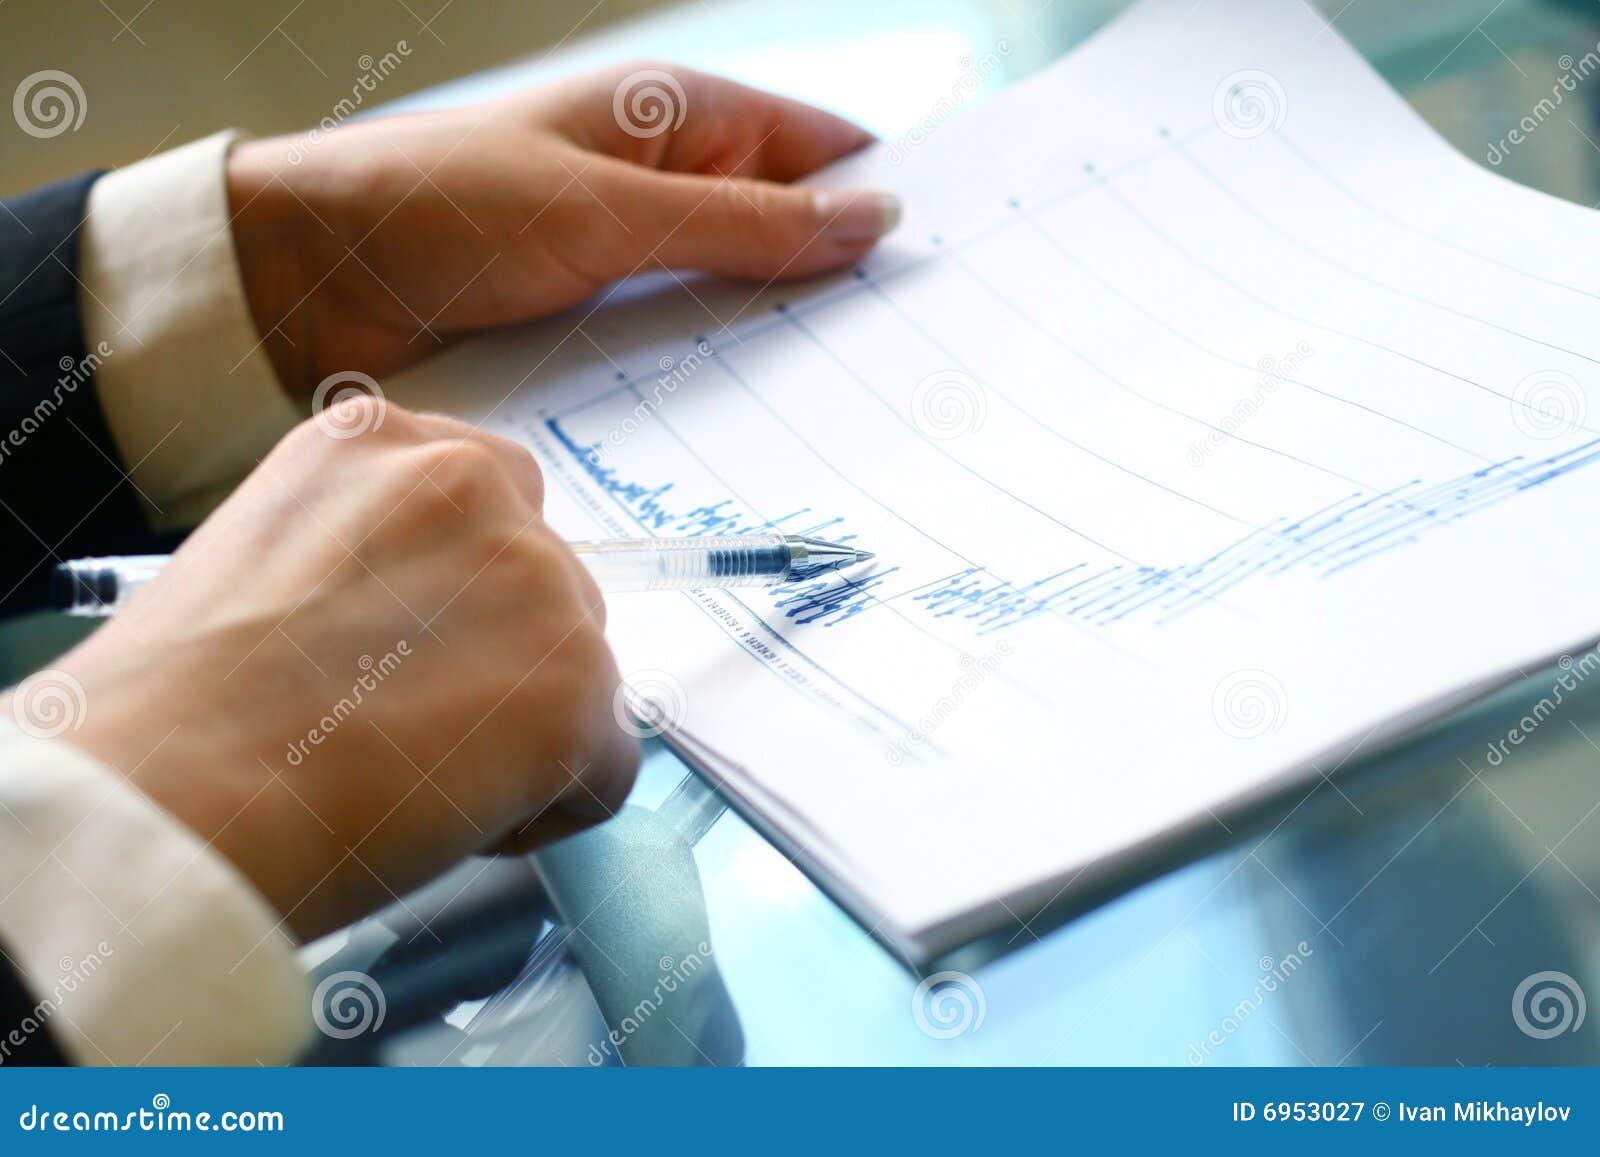 ebook Categorical Data Analysis Using the